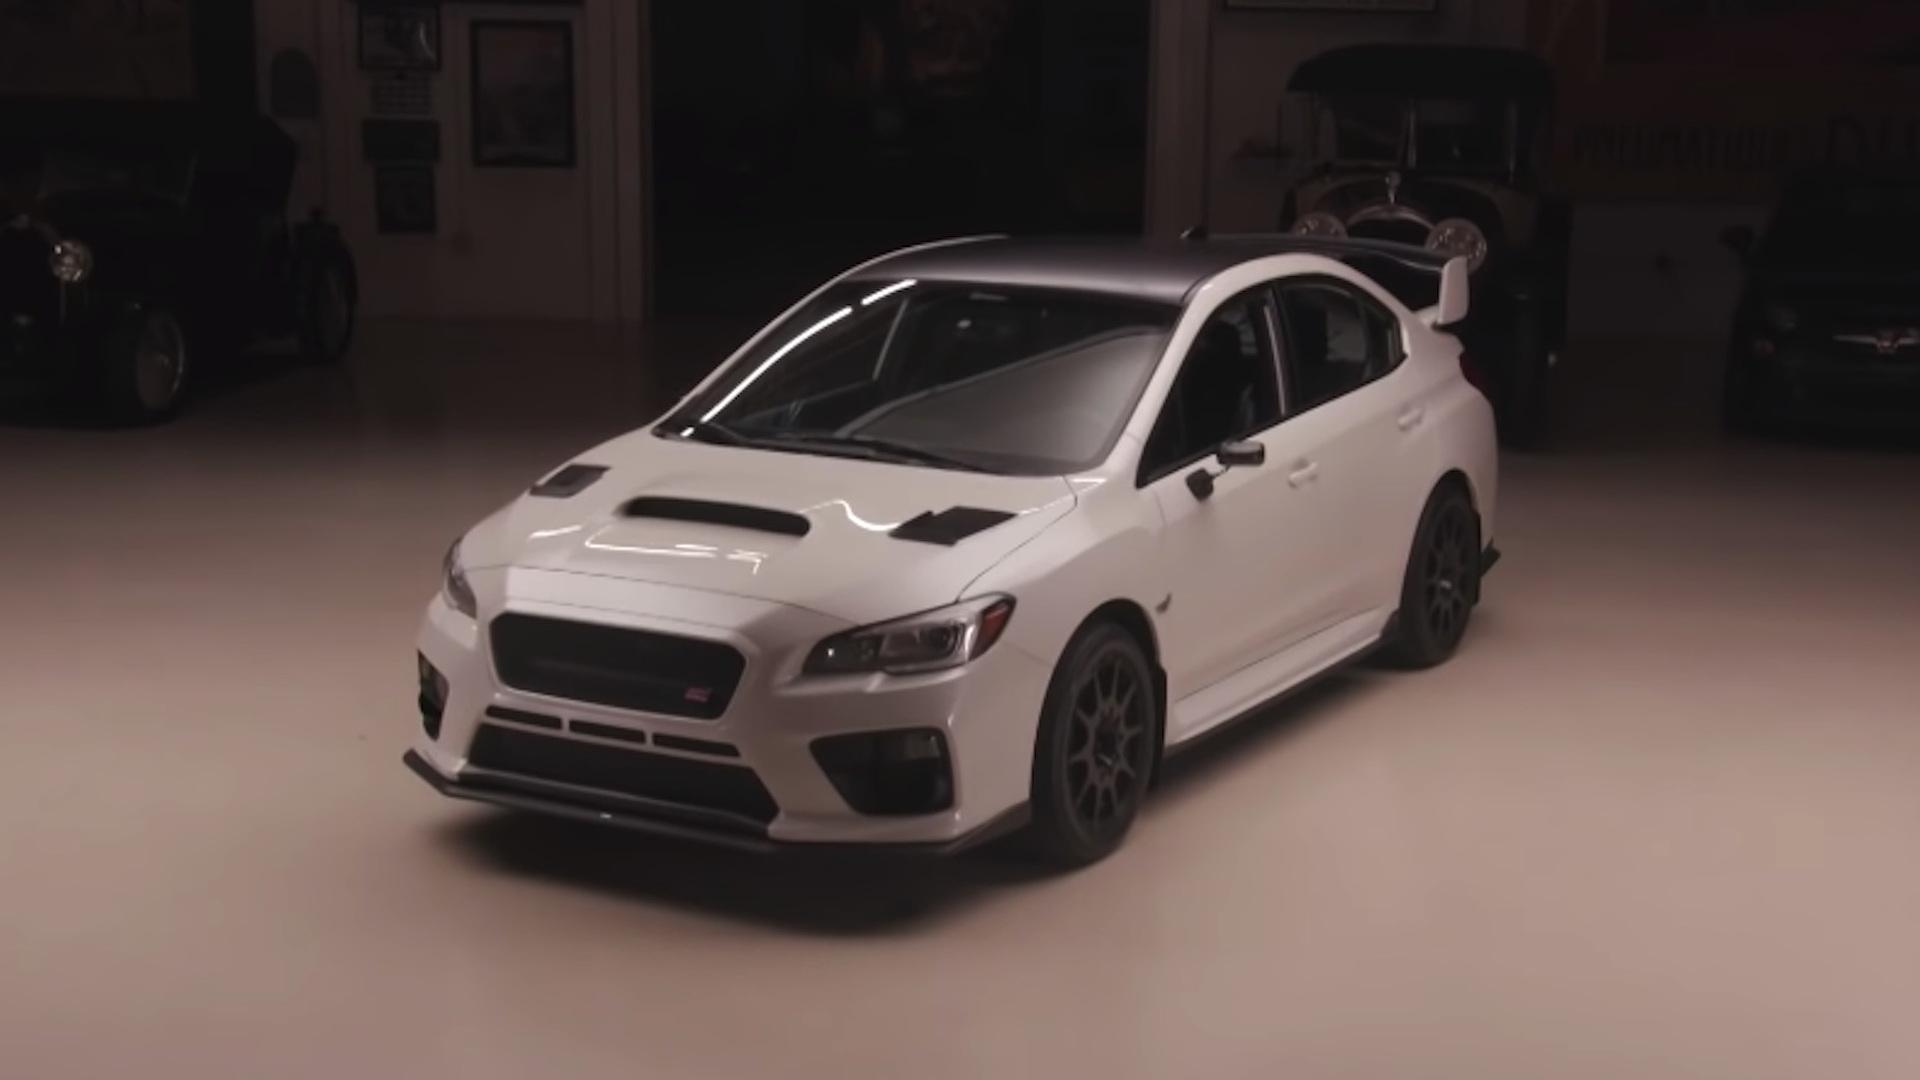 Buck Lasek's 2016 Subaru WRX STI on Jay Leno's Garage